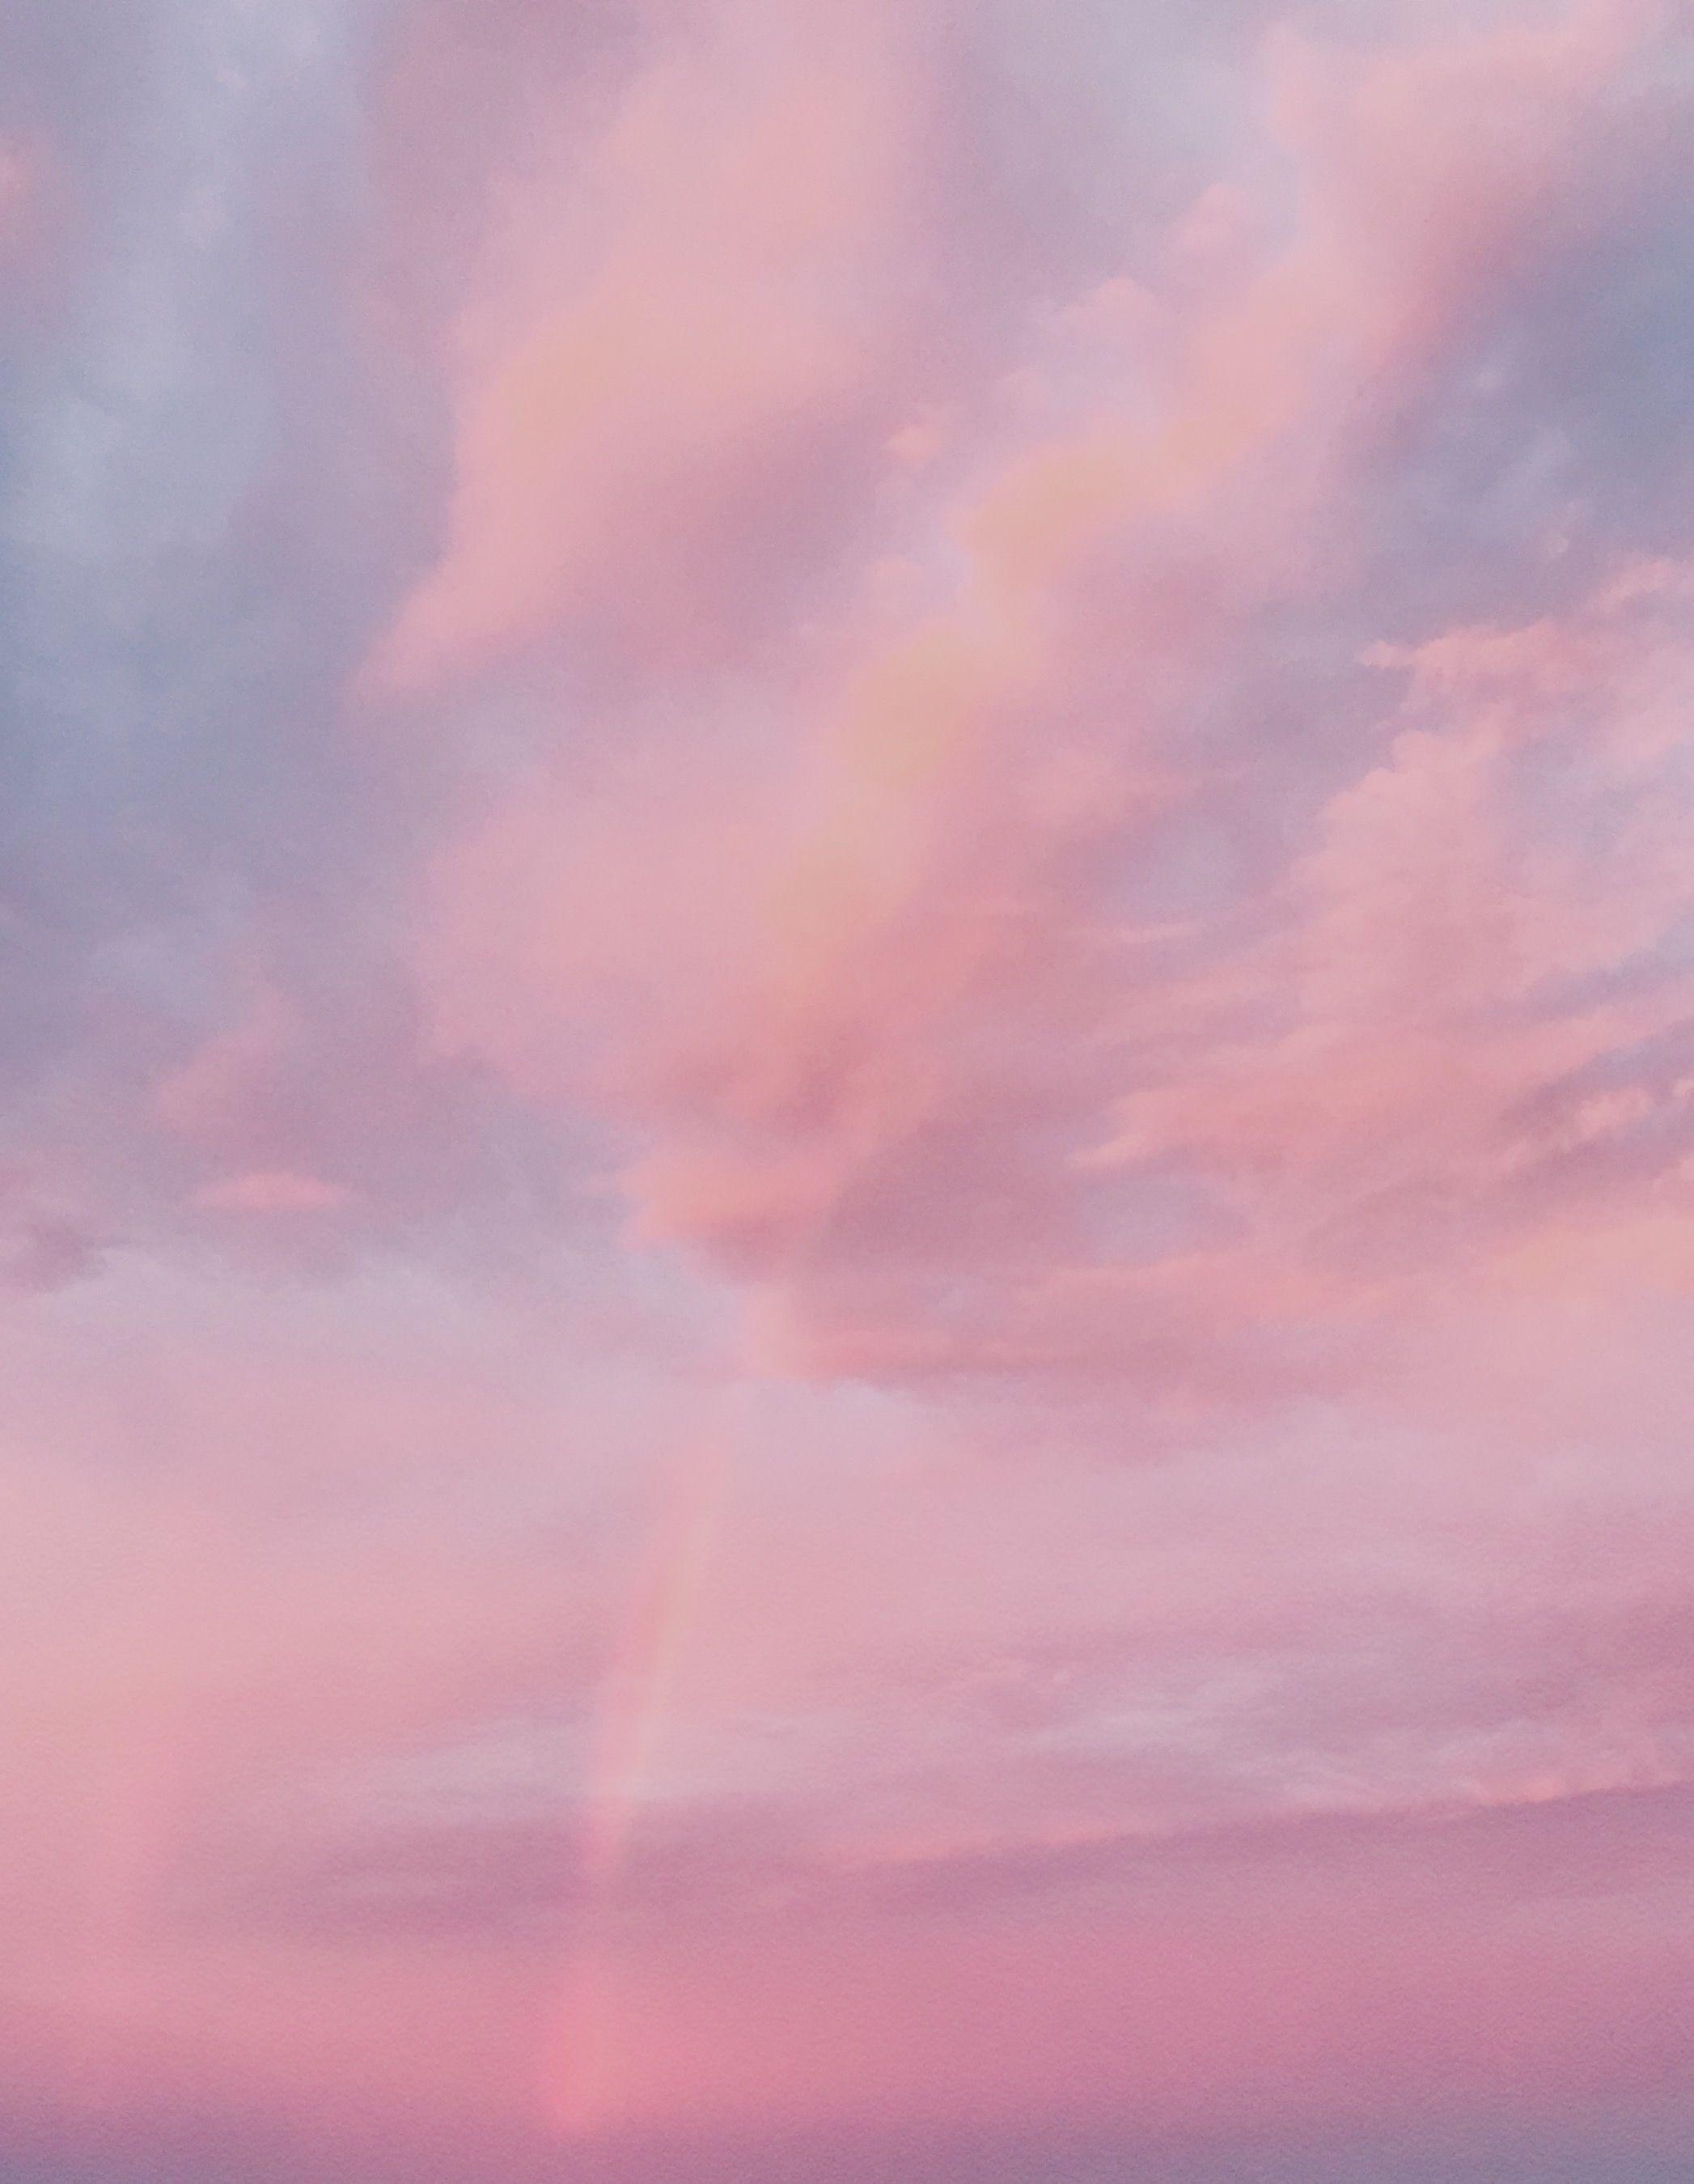 Pink Sky Aesthetic Pastel Wallpapers Top Free Pink Sky Aesthetic Pastel Backgrounds Wallpaperaccess